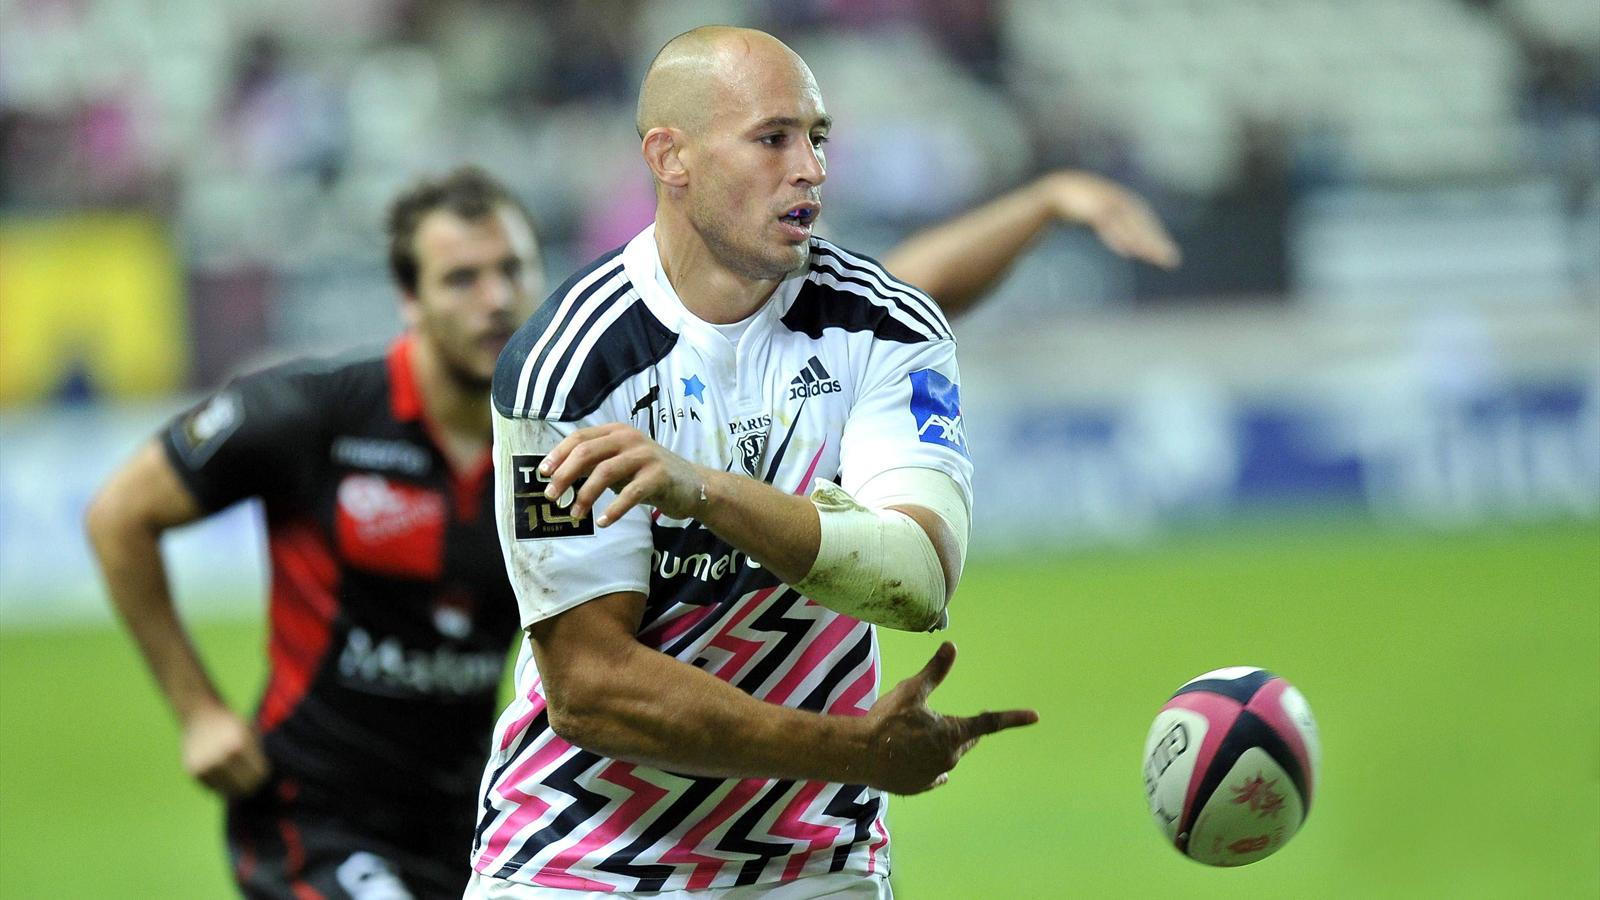 Rugby Lyon LOU vs Stade Français en direct live streaming